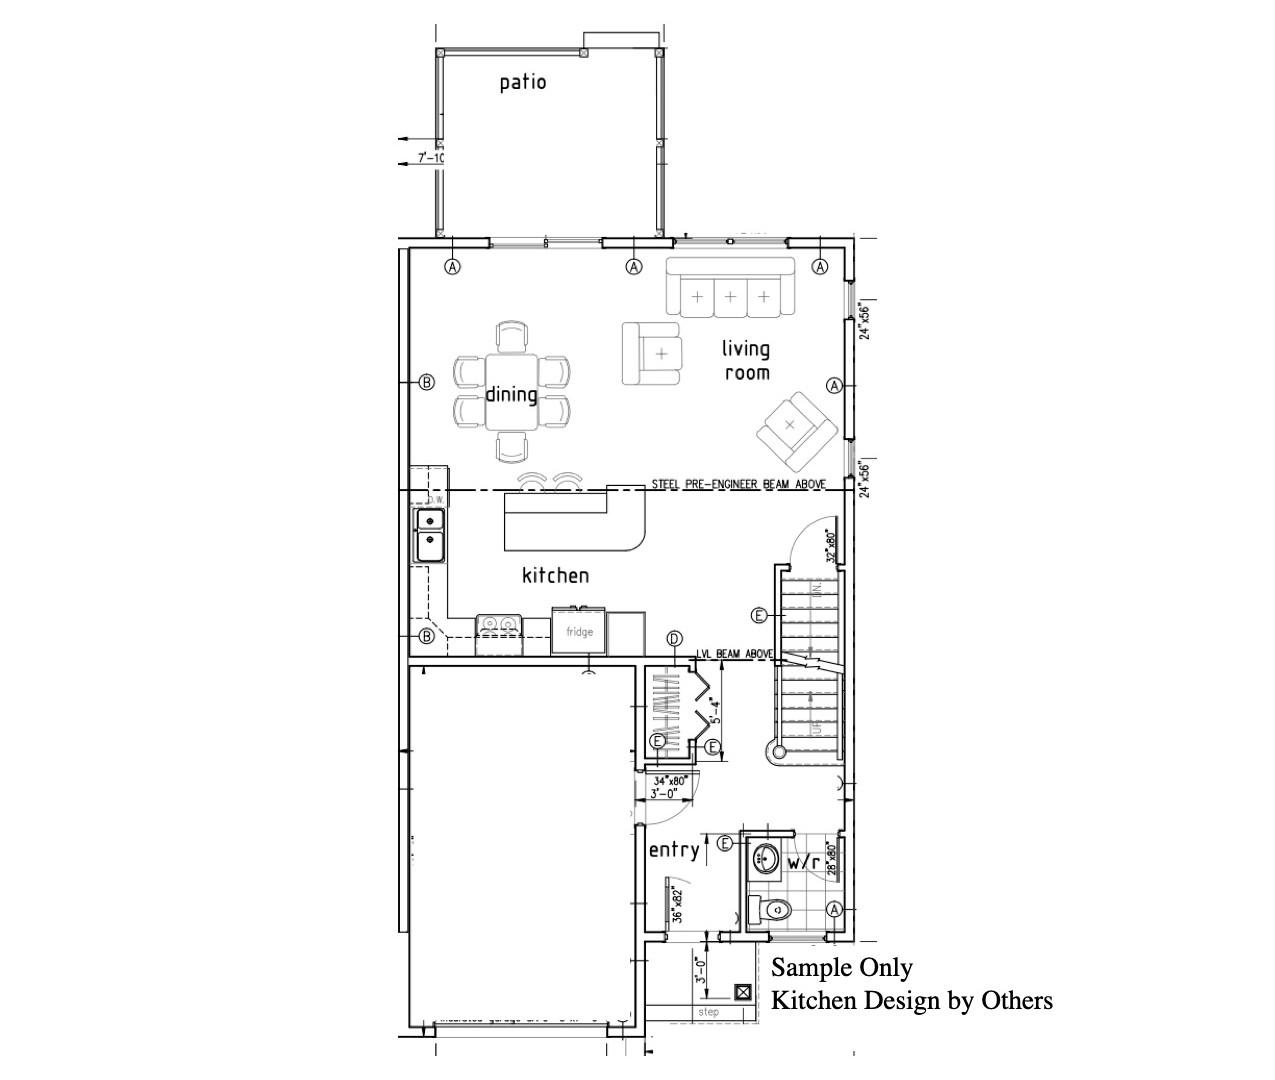 Semi Detached Floor Plan - Main Level.jp